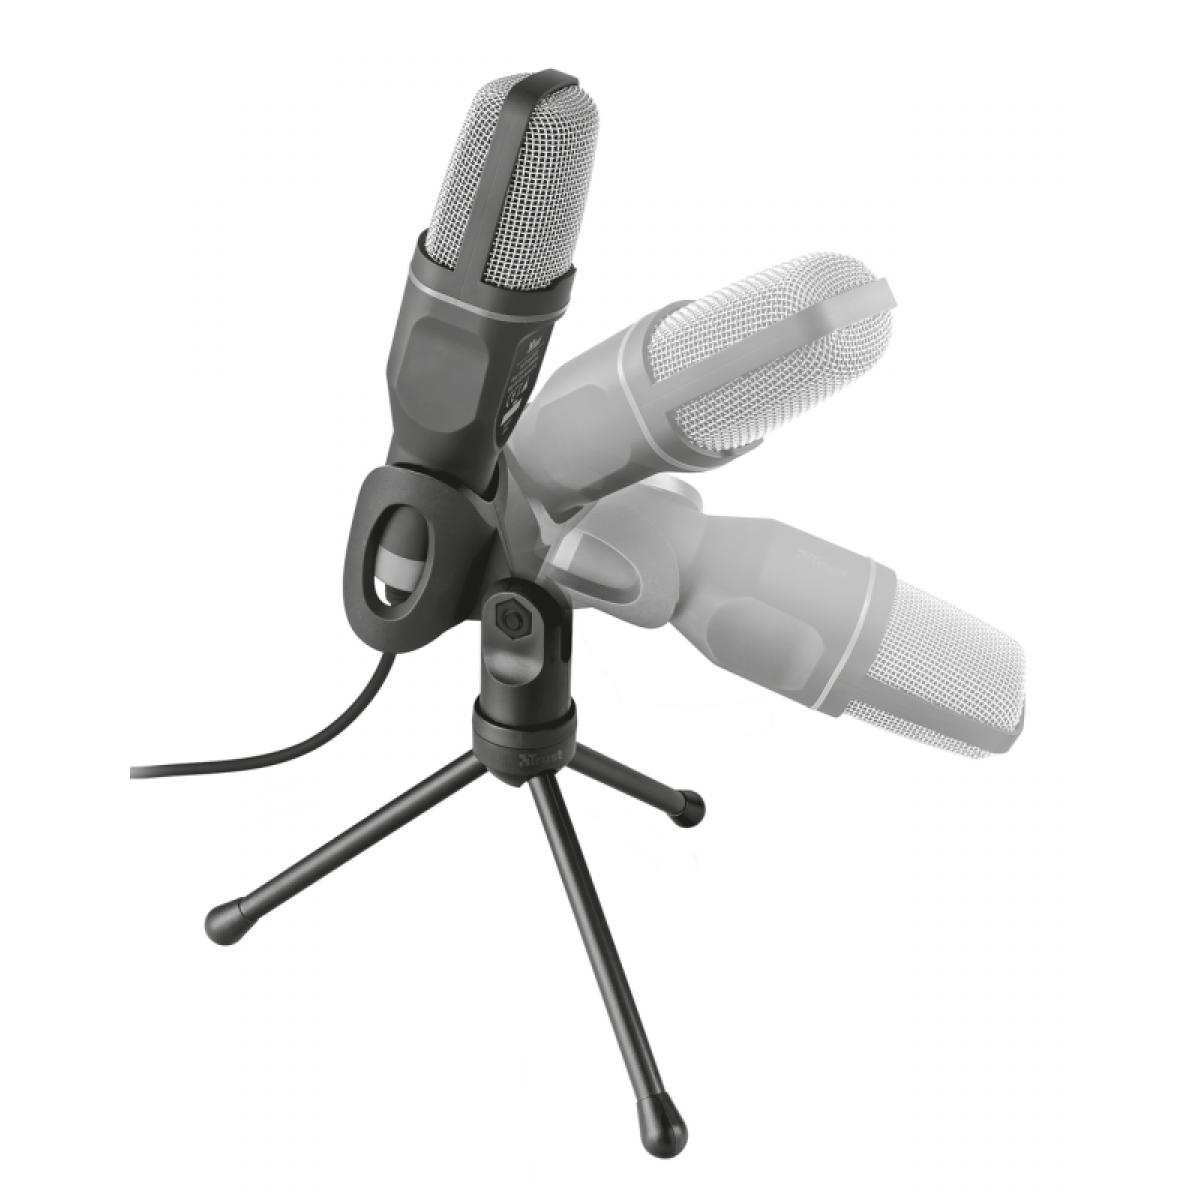 Microfone Streaming Trust, USB, Voxa